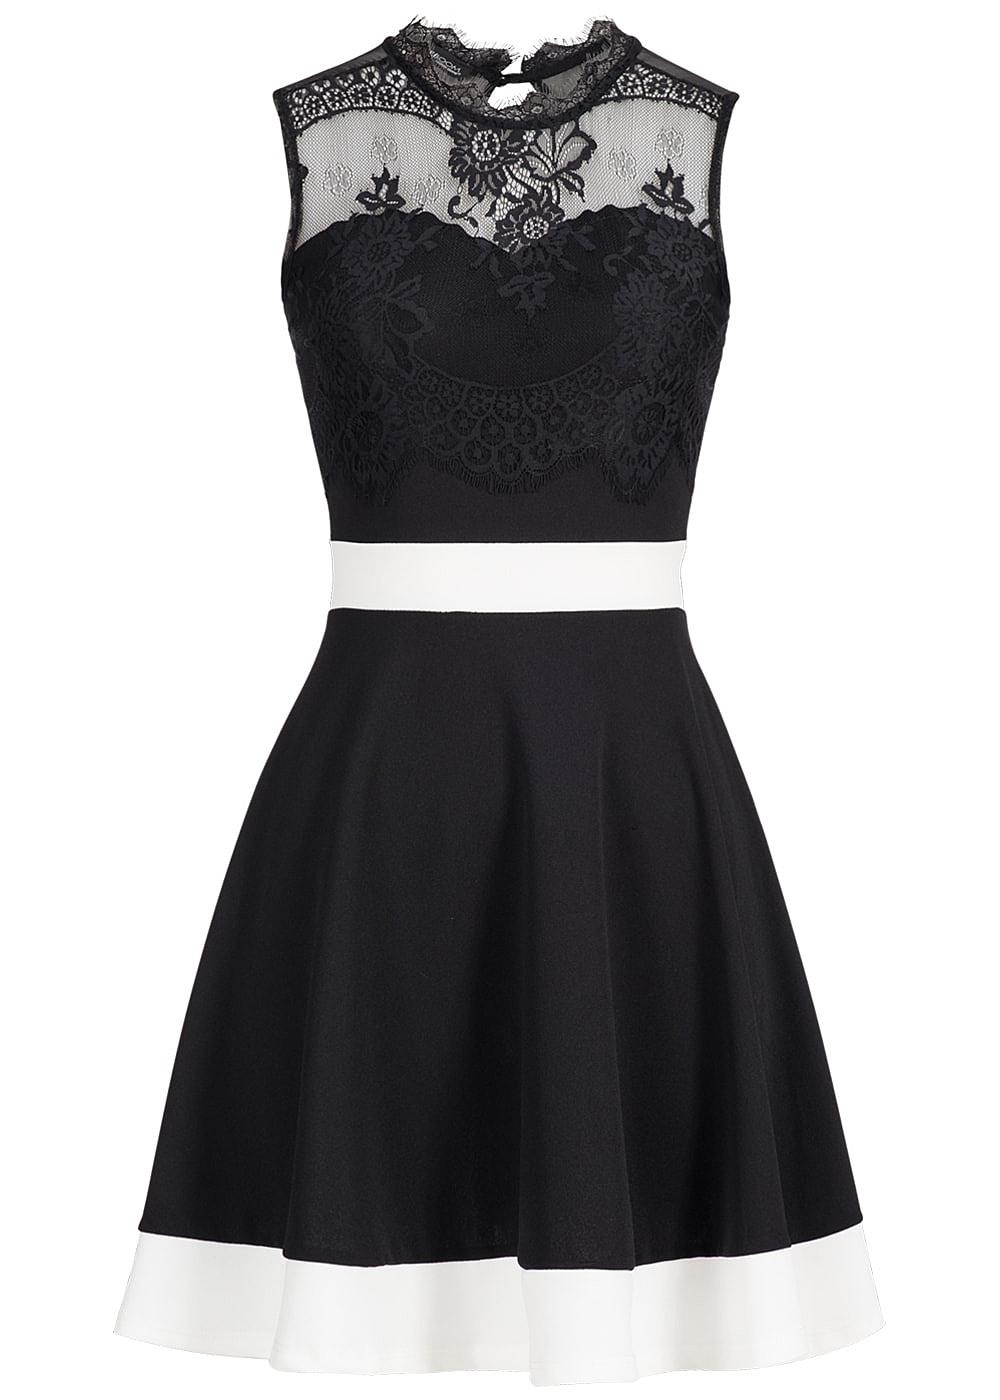 top schwarz weißes kleid bester preis - abendkleid